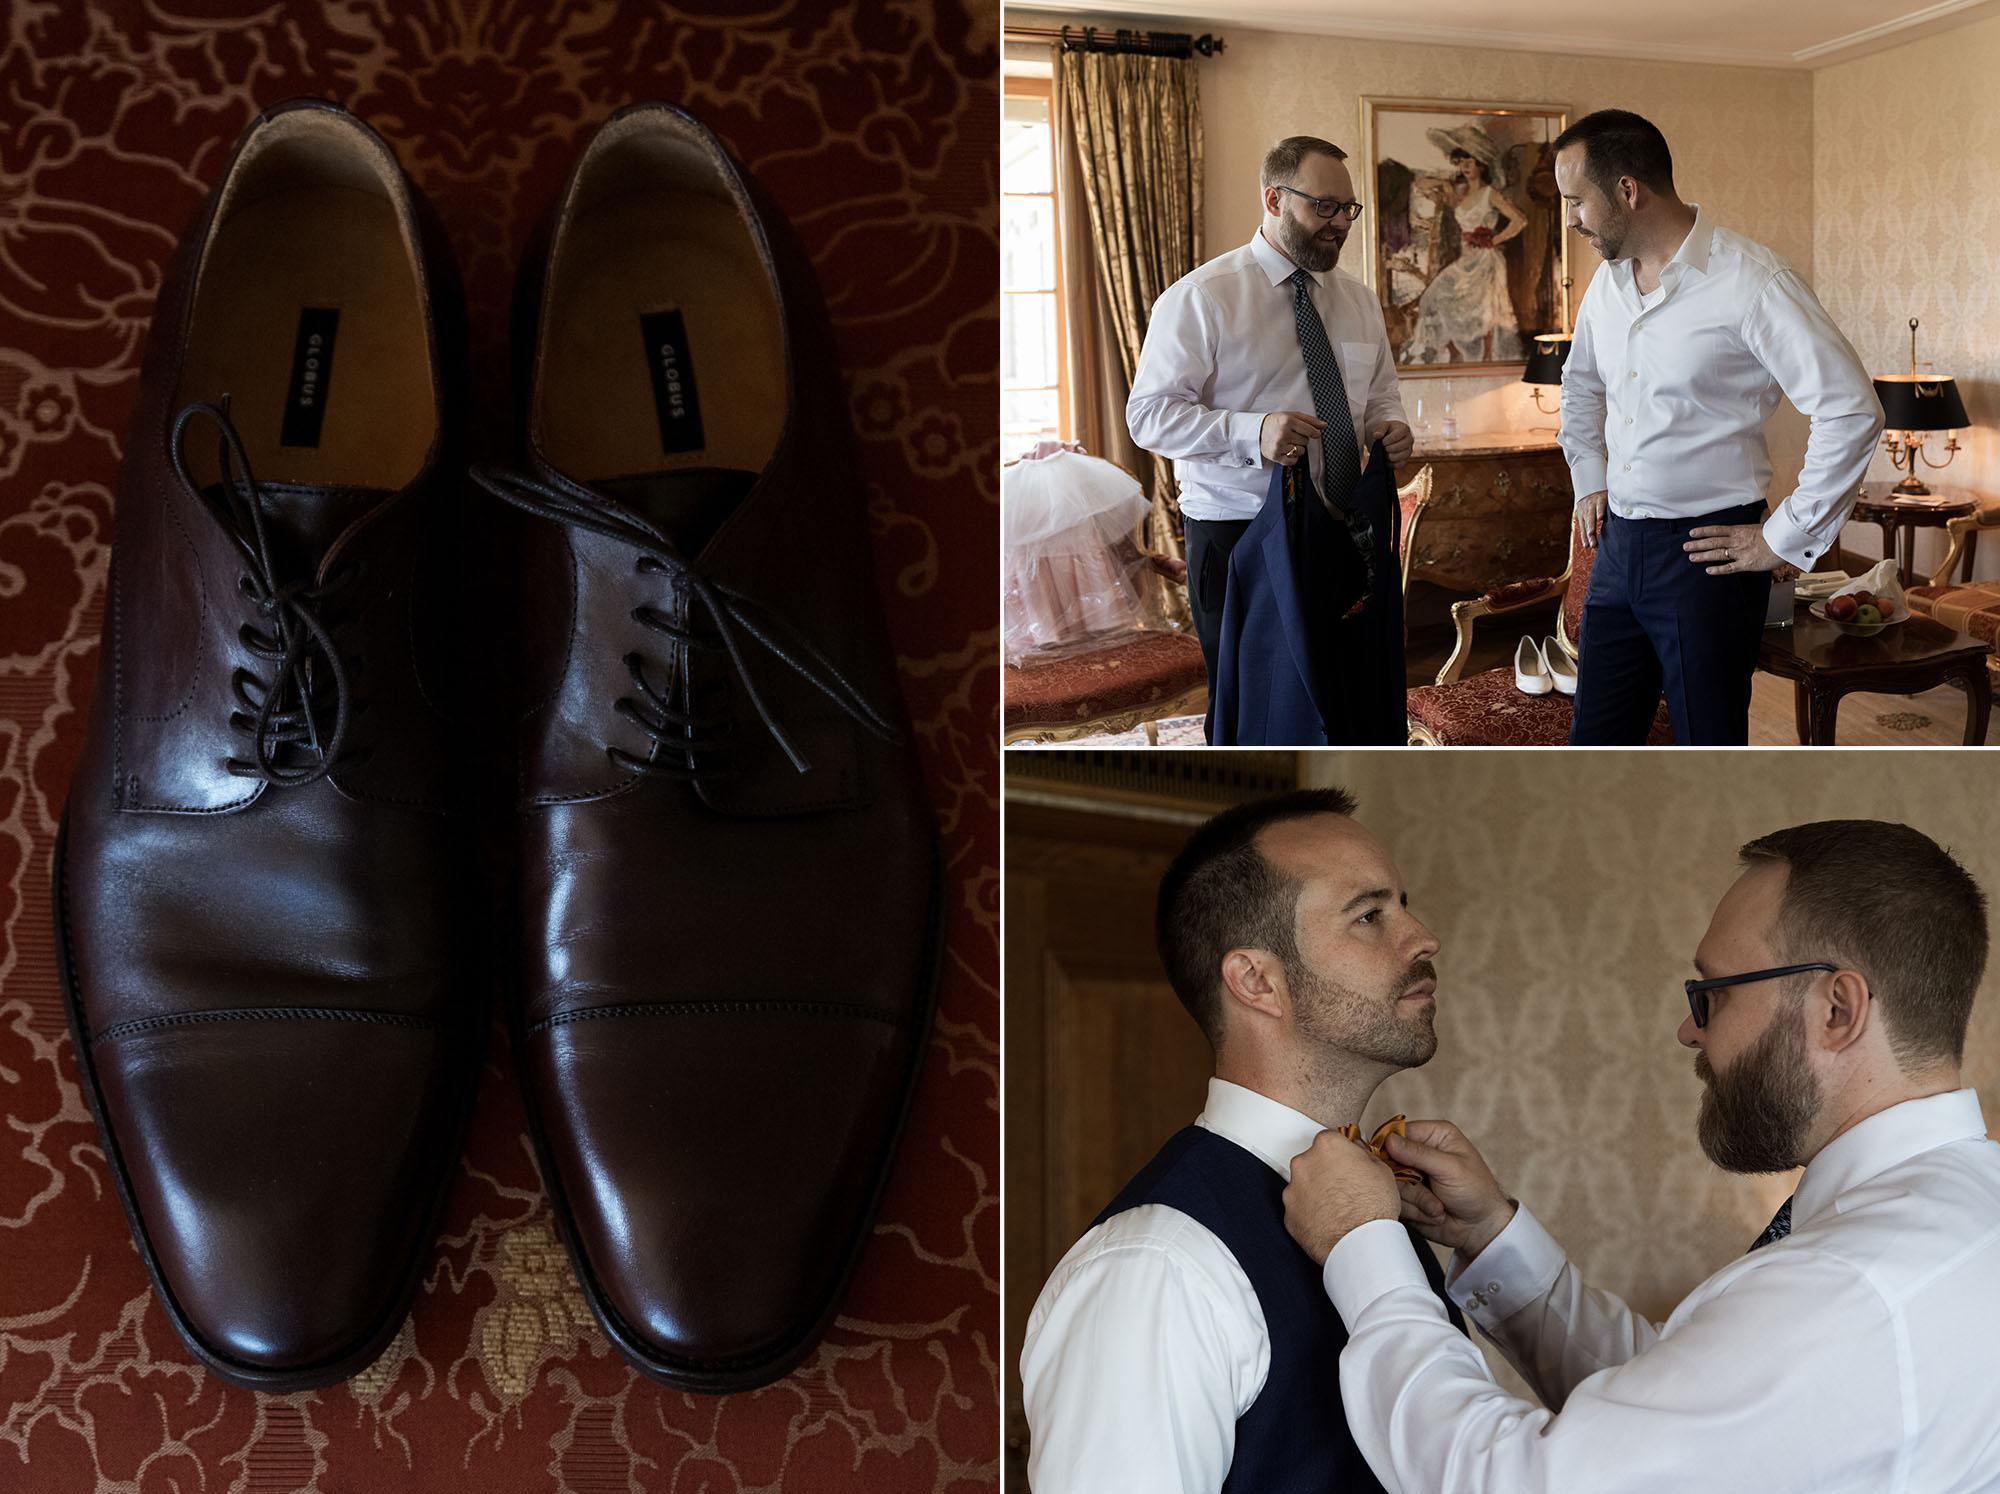 Getting Ready Bräutigam - Hochzeitsfotograf Basel - Hochzeit im Grand Hotel Les Trois Rois